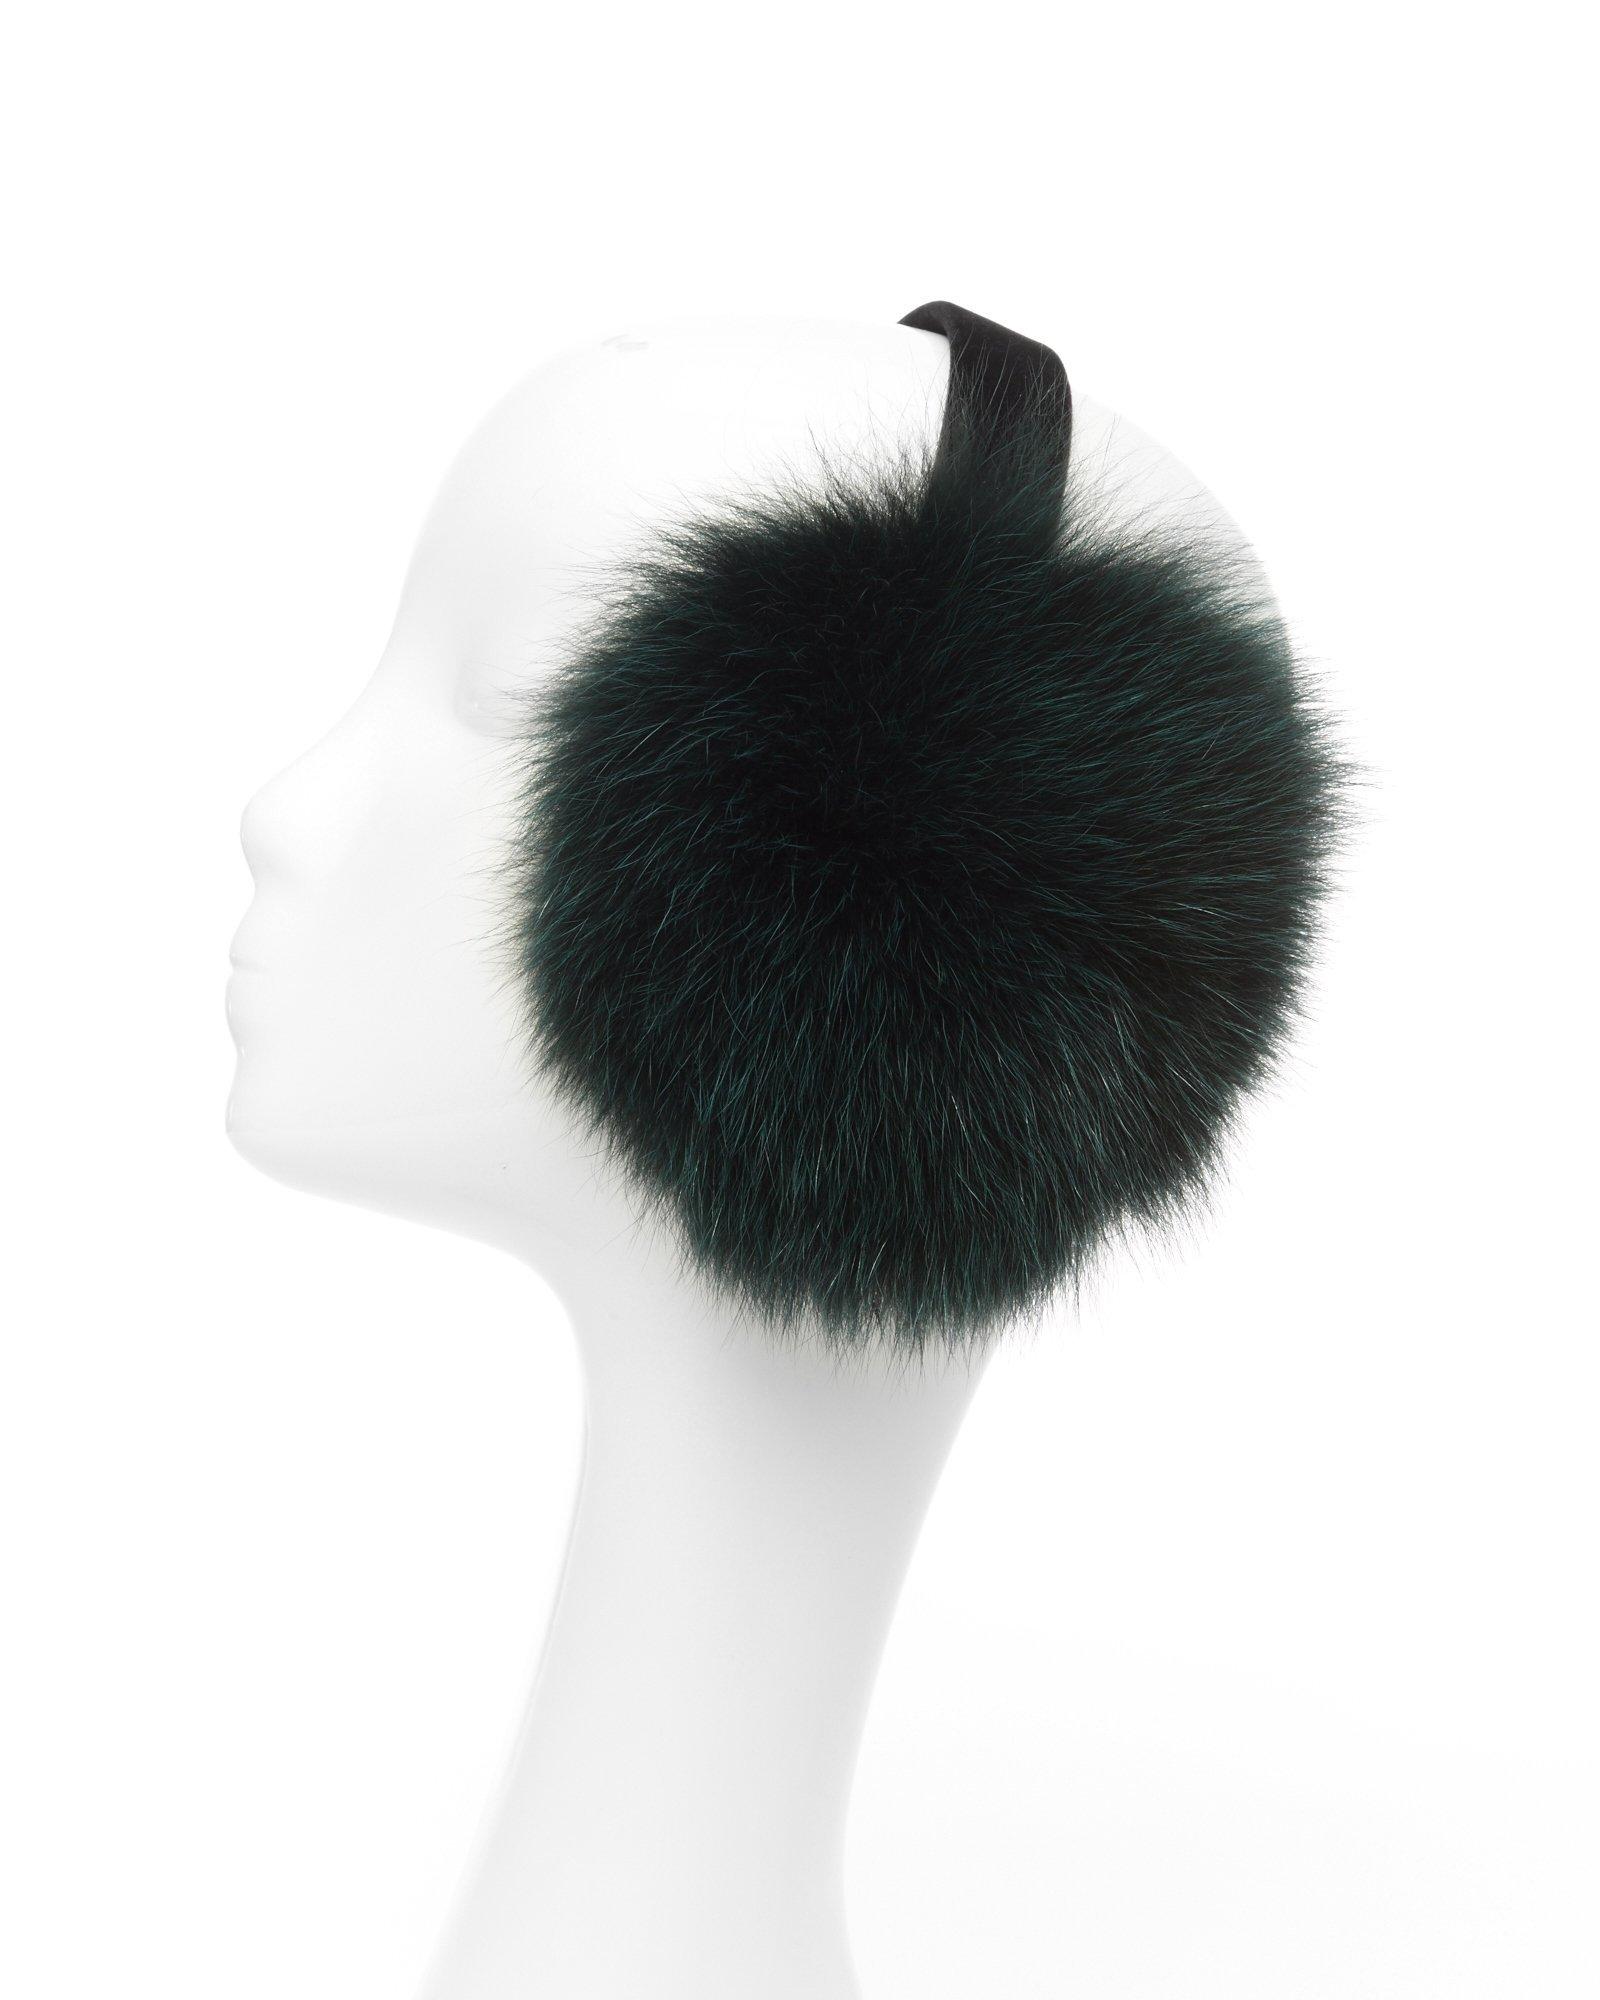 Evergreen Dyed Fox Fur Earmuffs